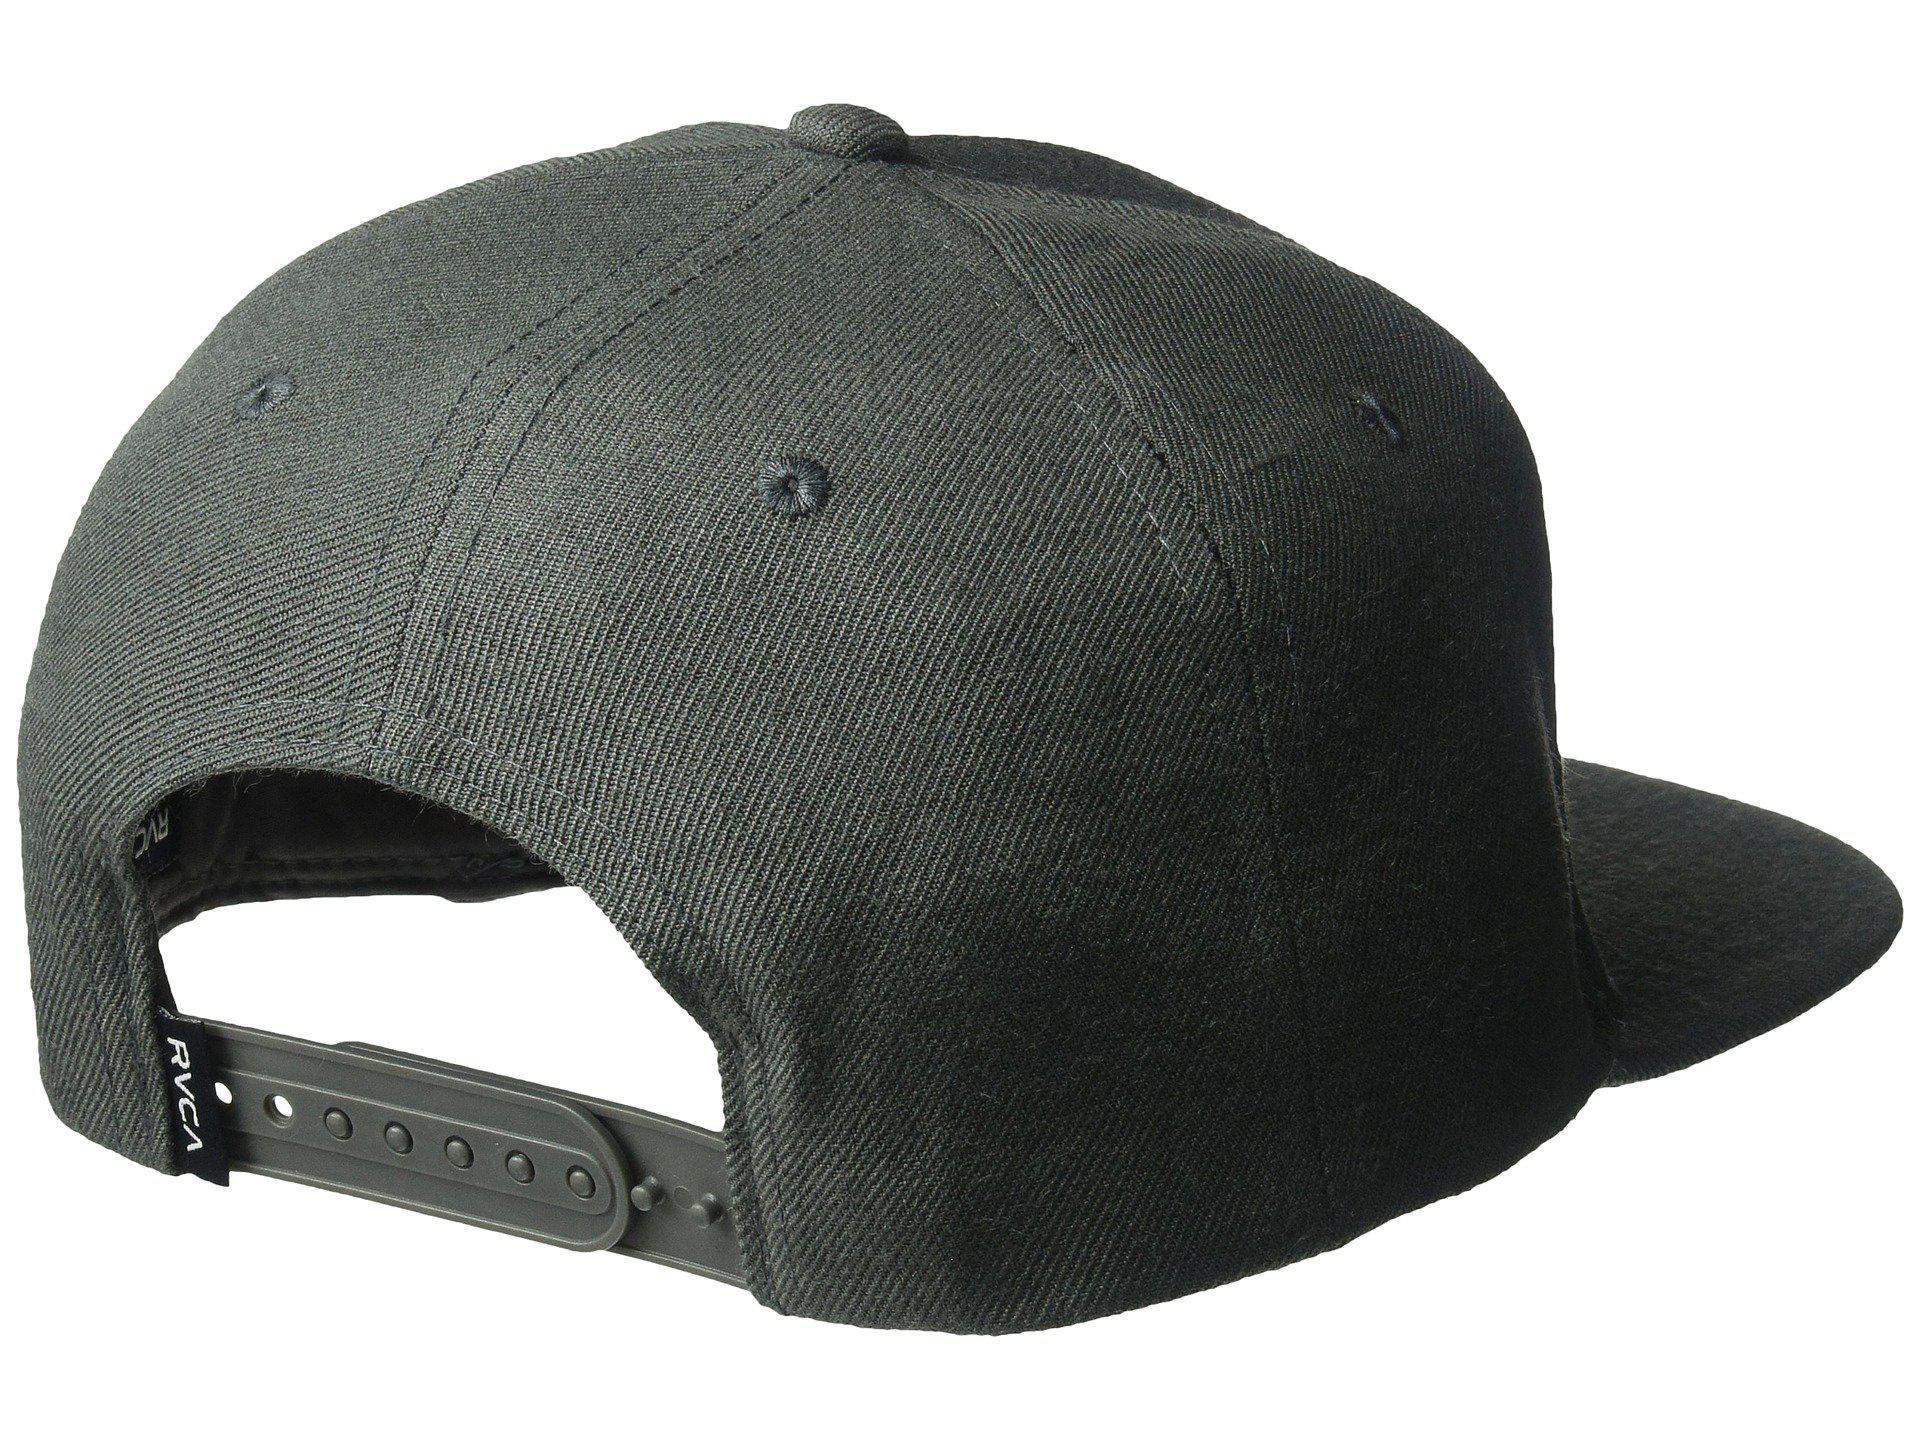 detailed look c0e61 0e870 ... norway lyst rvca ensign snapback black caps in black for men d8e8f c5fcd